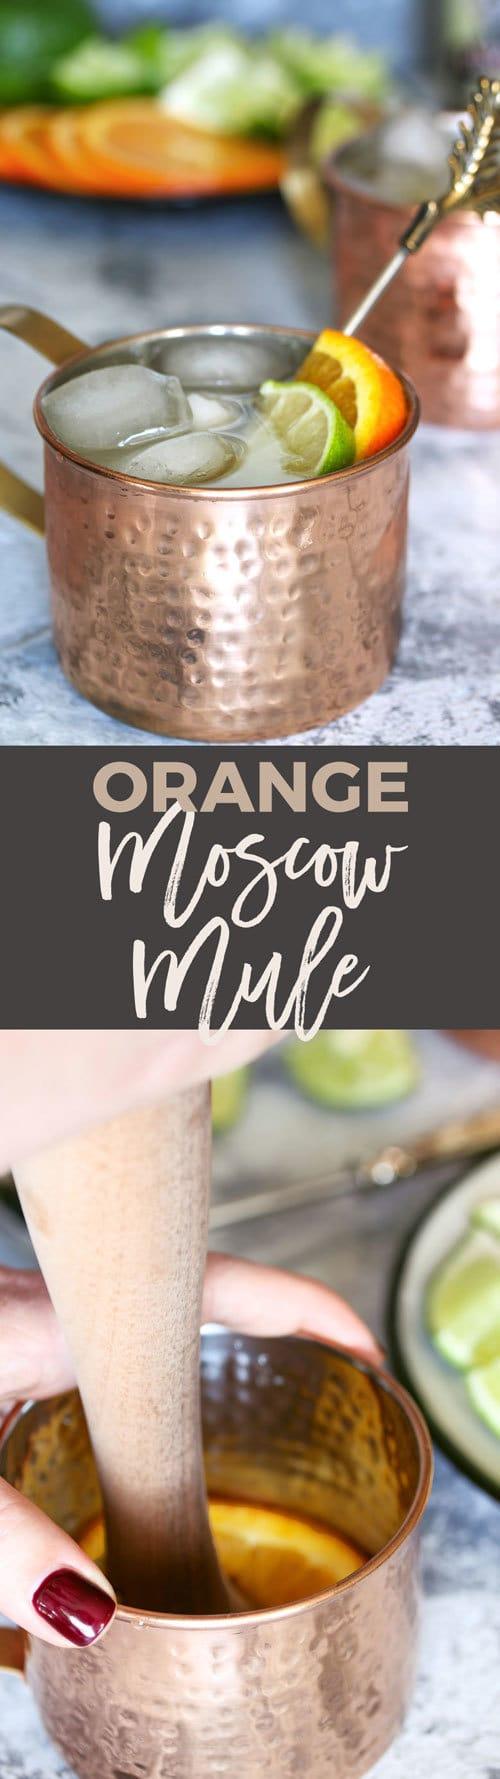 orange Moscow mule pin